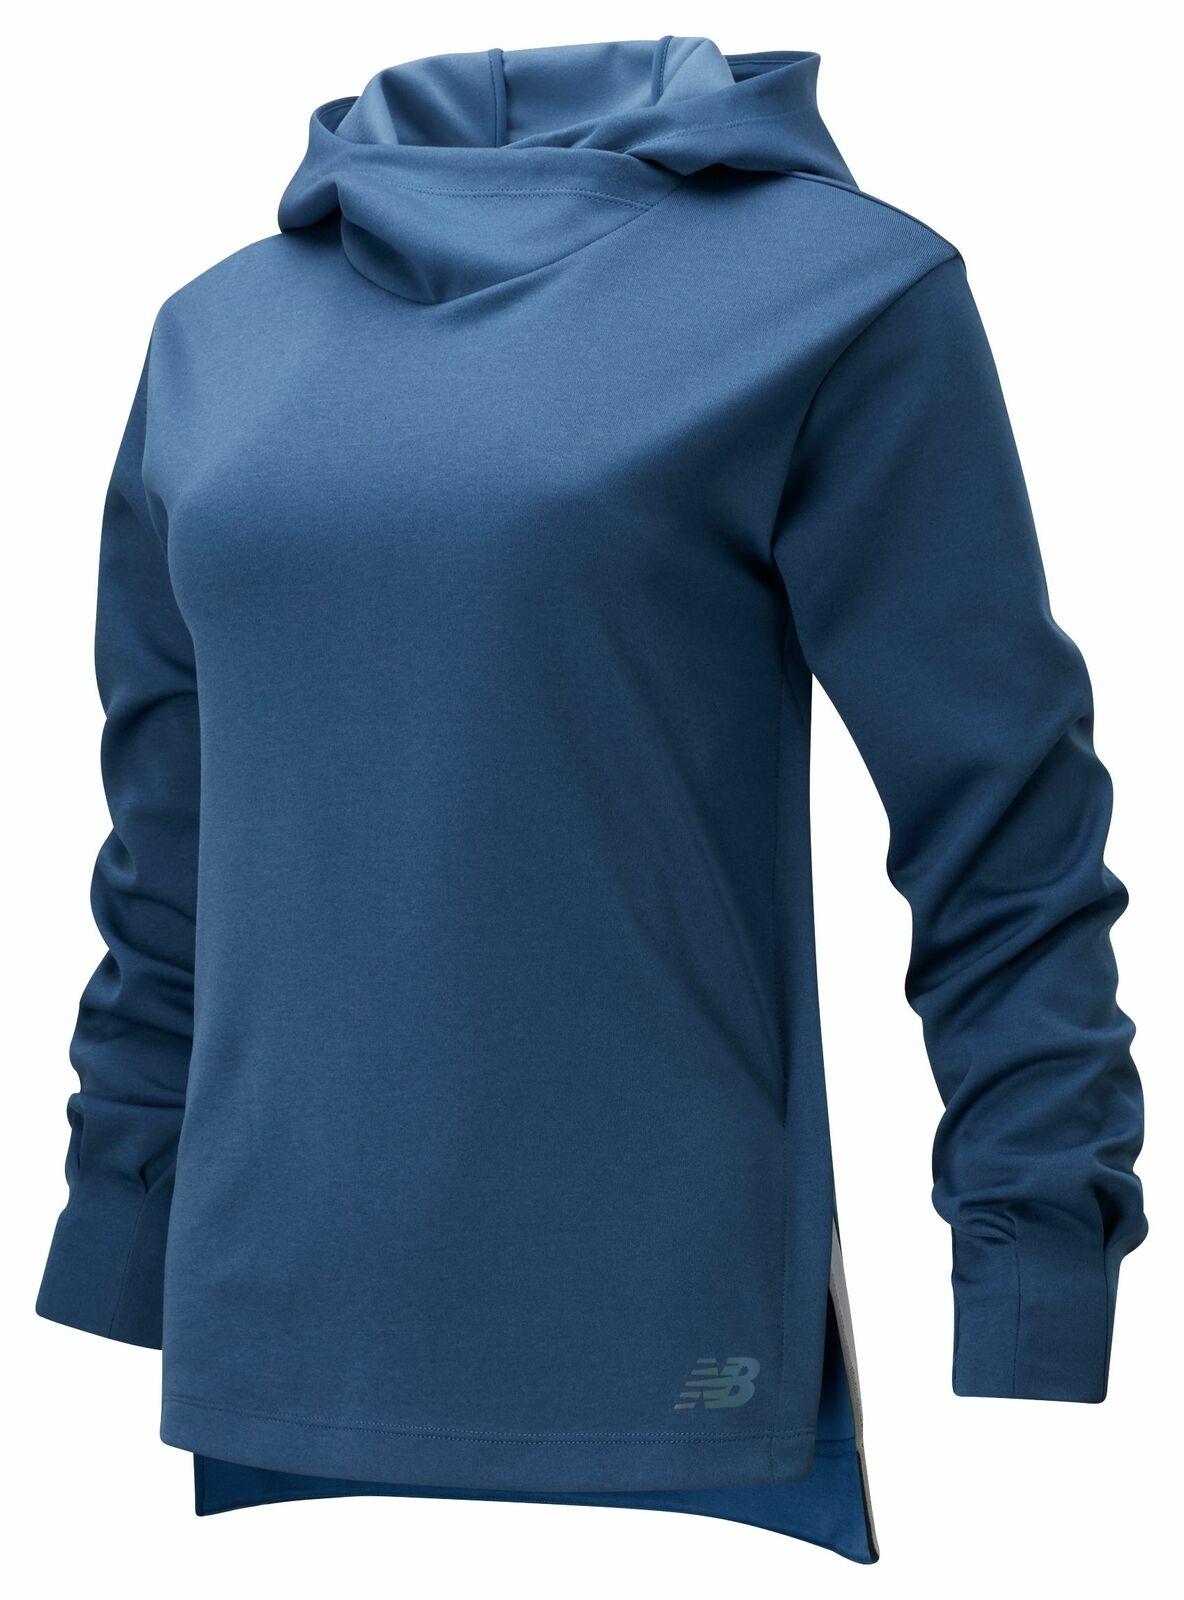 New Balance Women's Q Speed Run Crew Sweatshirt Blue